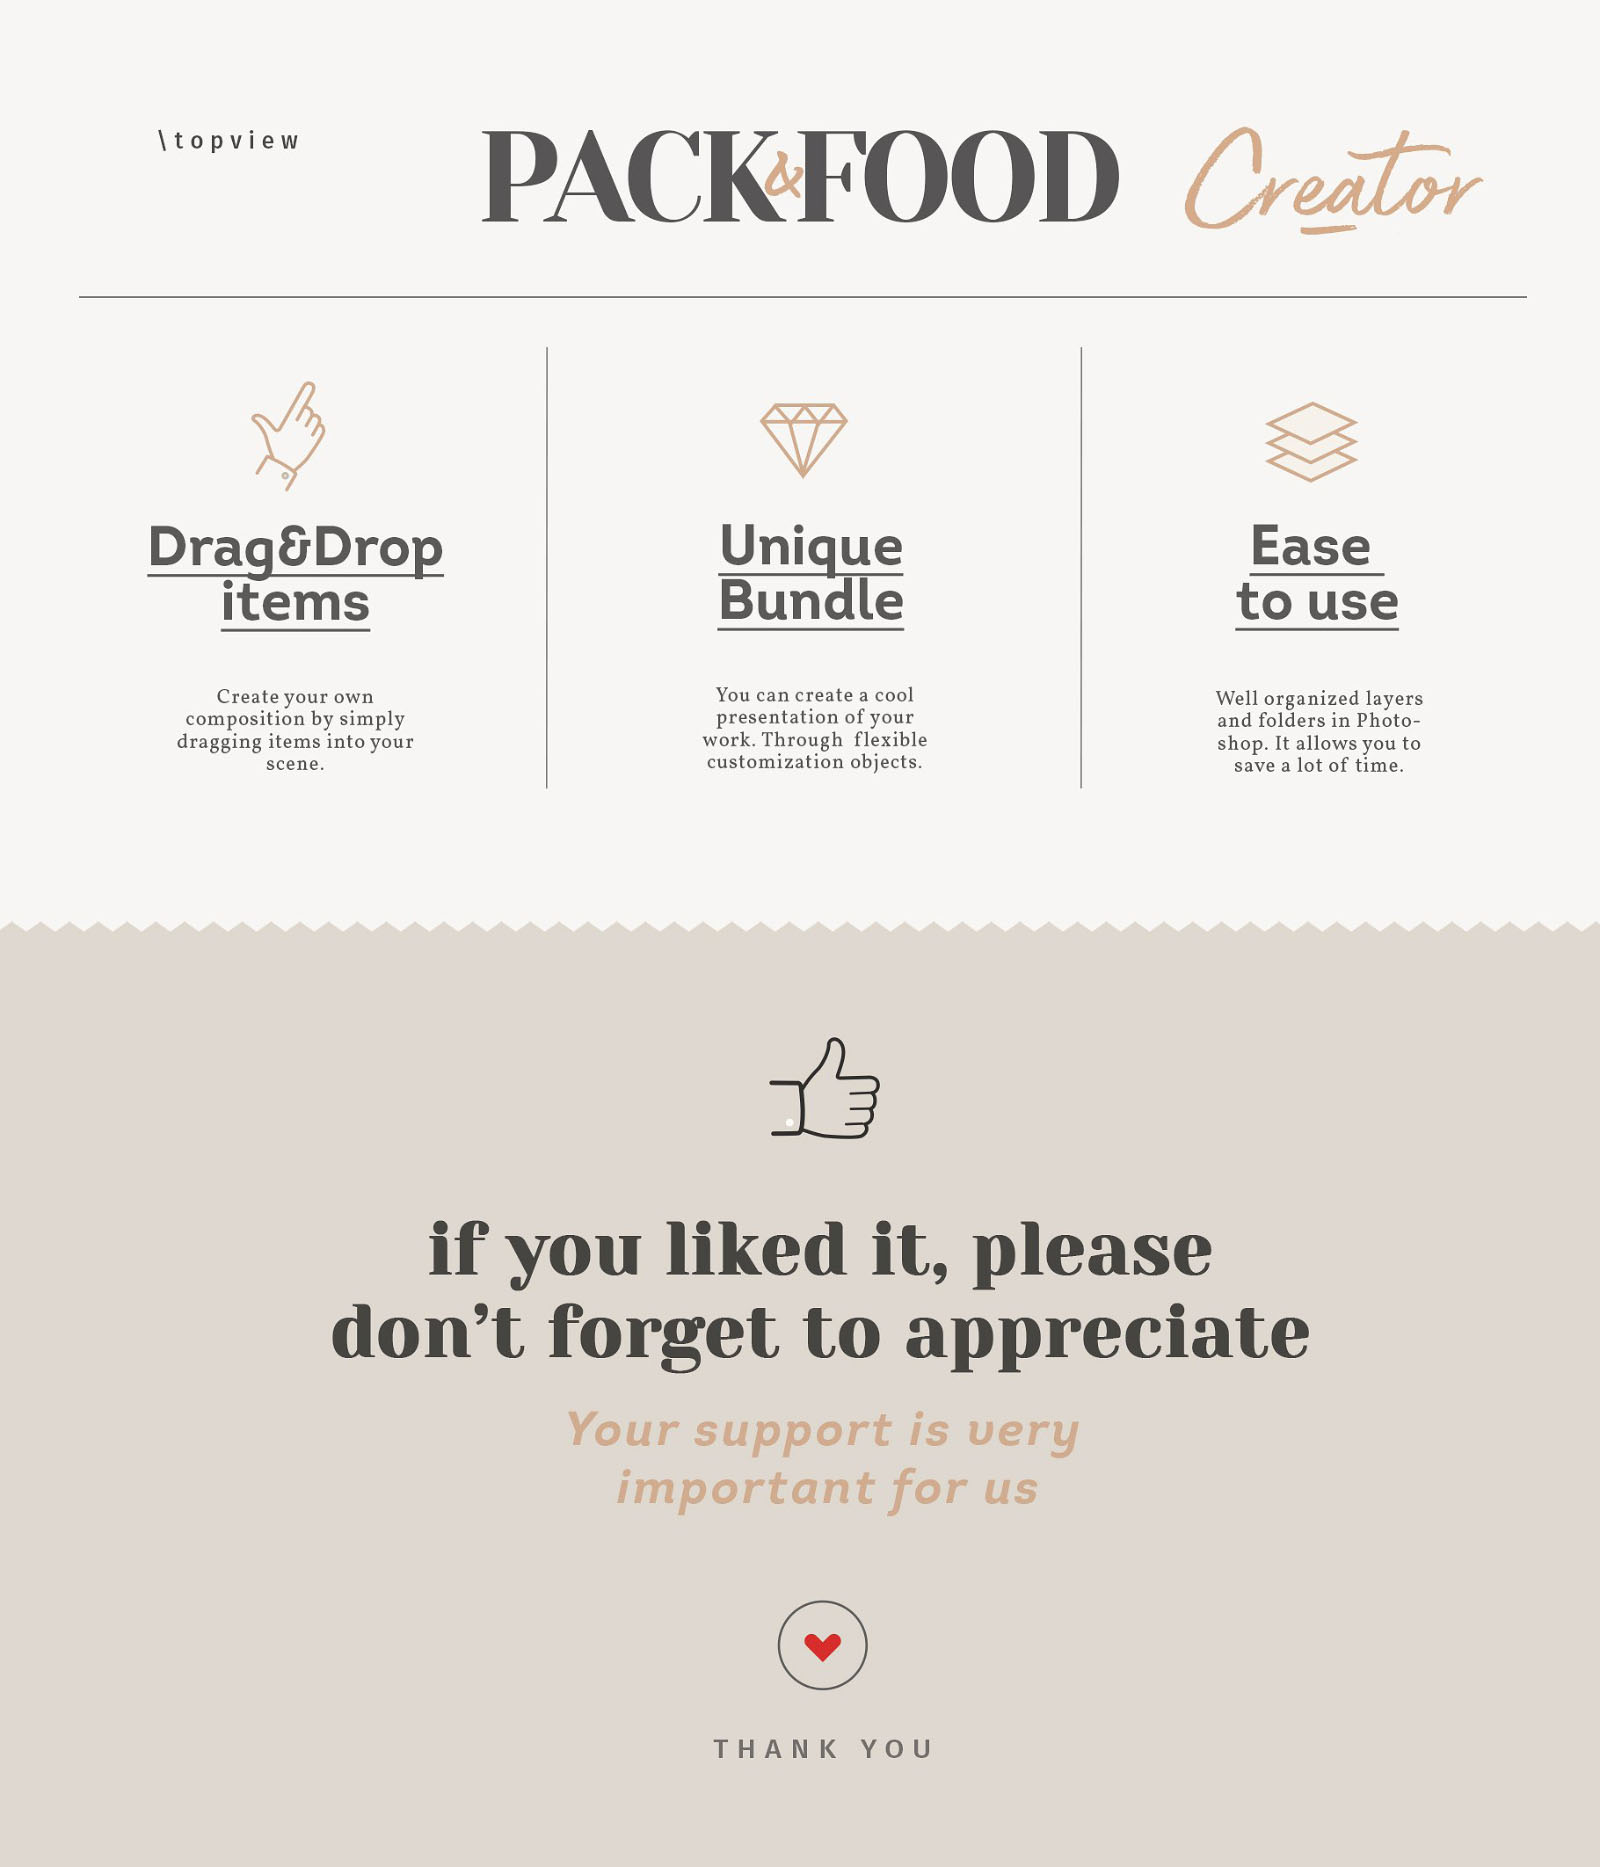 Food Packaging Mockup - Features